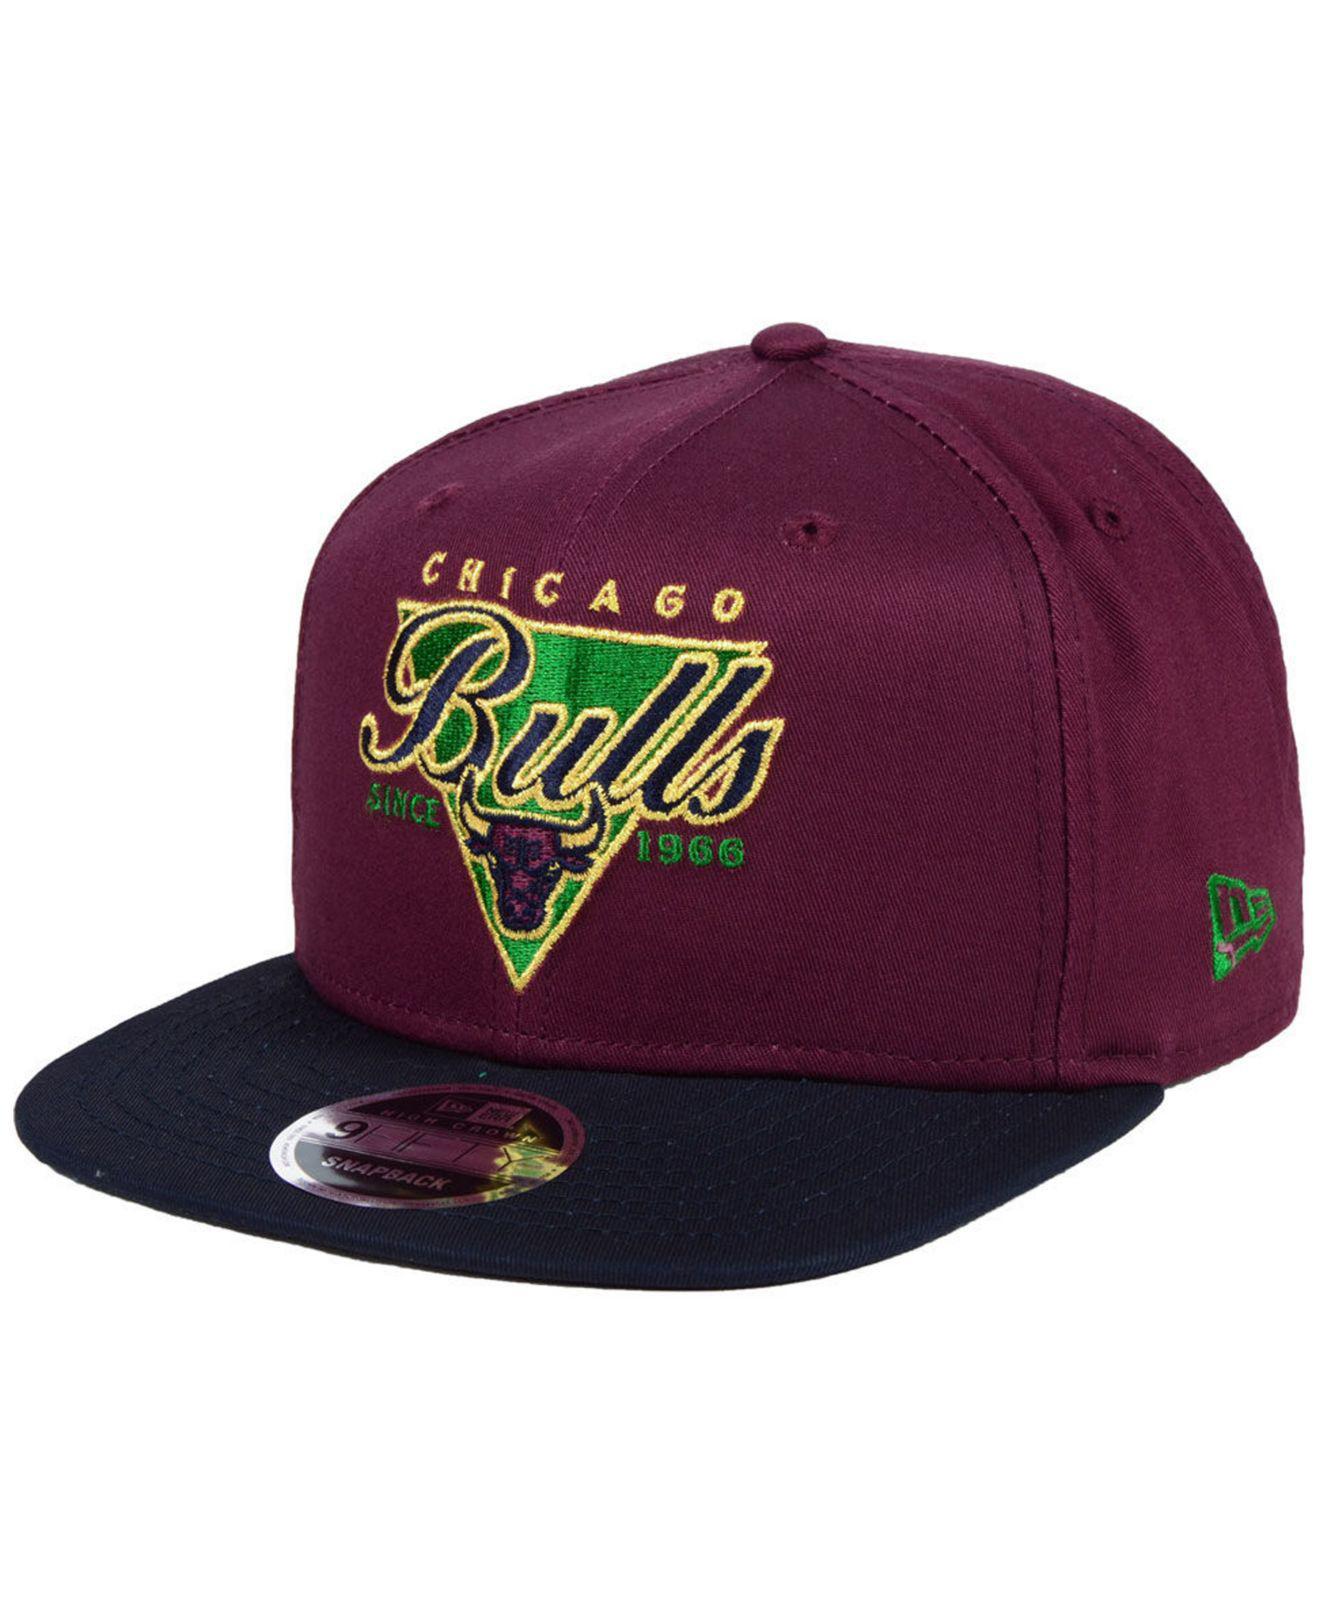 buy popular bf56a 286de KTZ Chicago Bulls 90s Throwback 9fifty Snapback Cap in Purple for ...